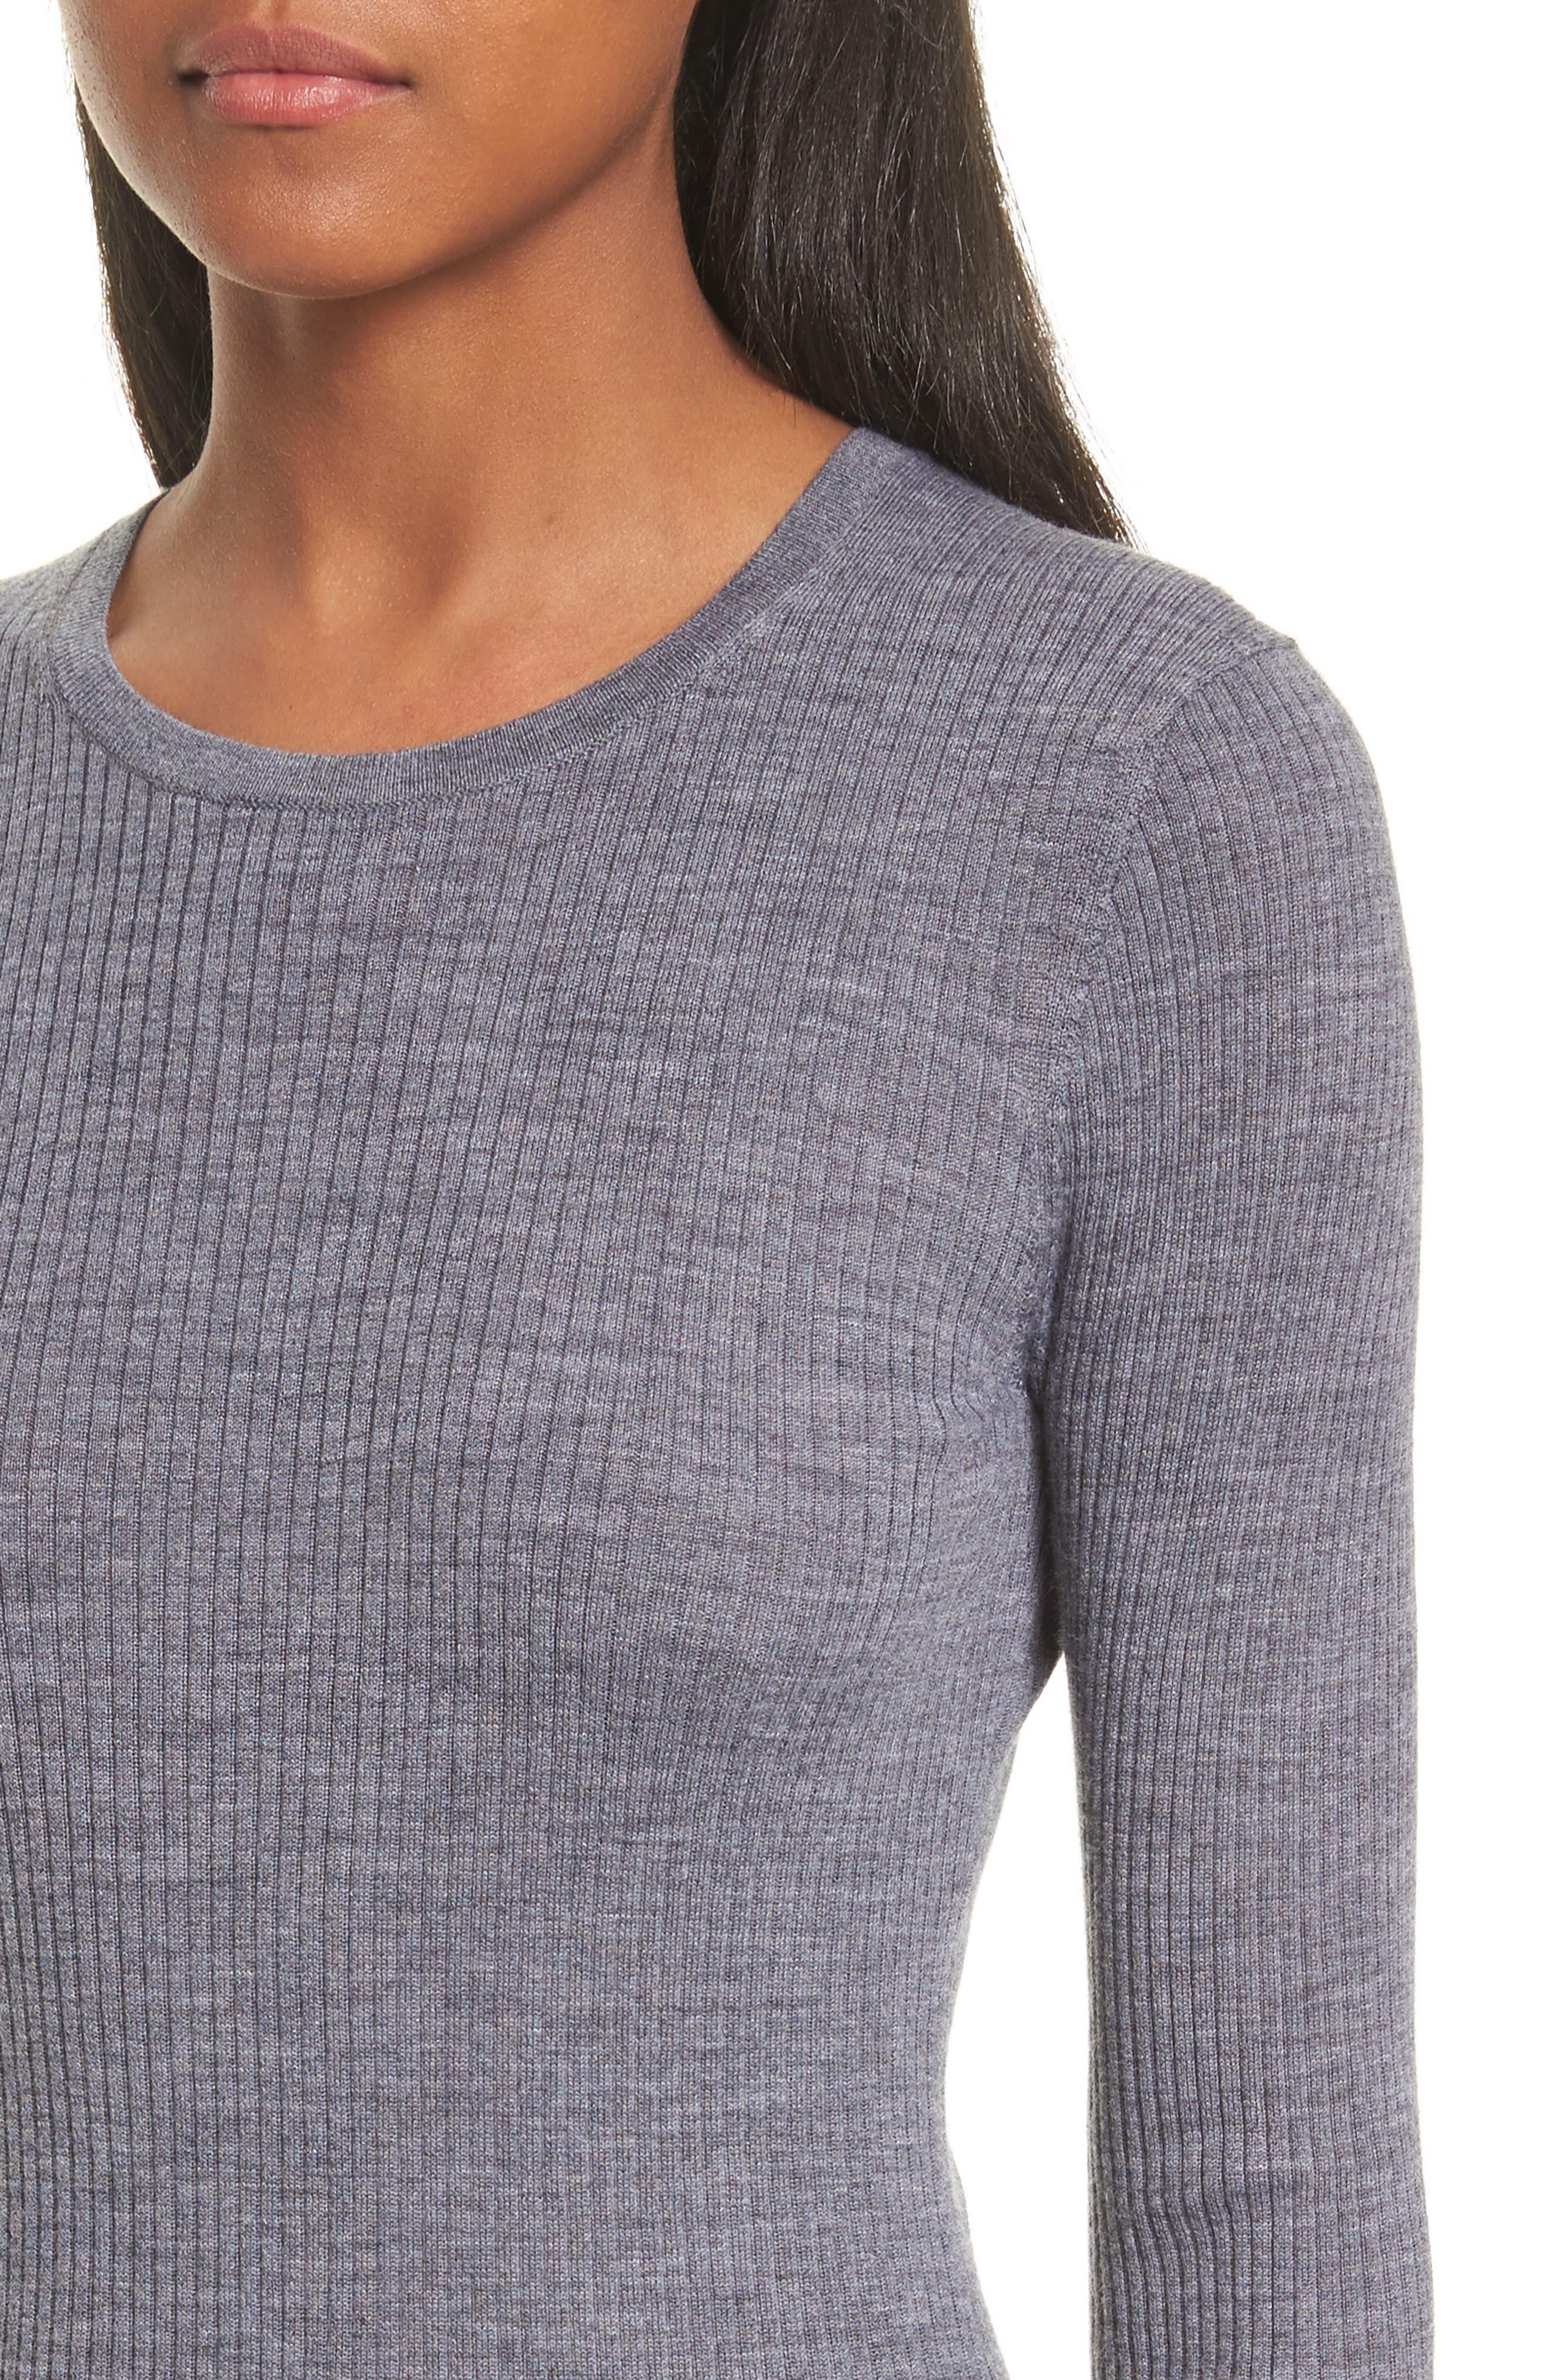 Mirzi B Merino Wool Sweater,                             Alternate thumbnail 4, color,                             059